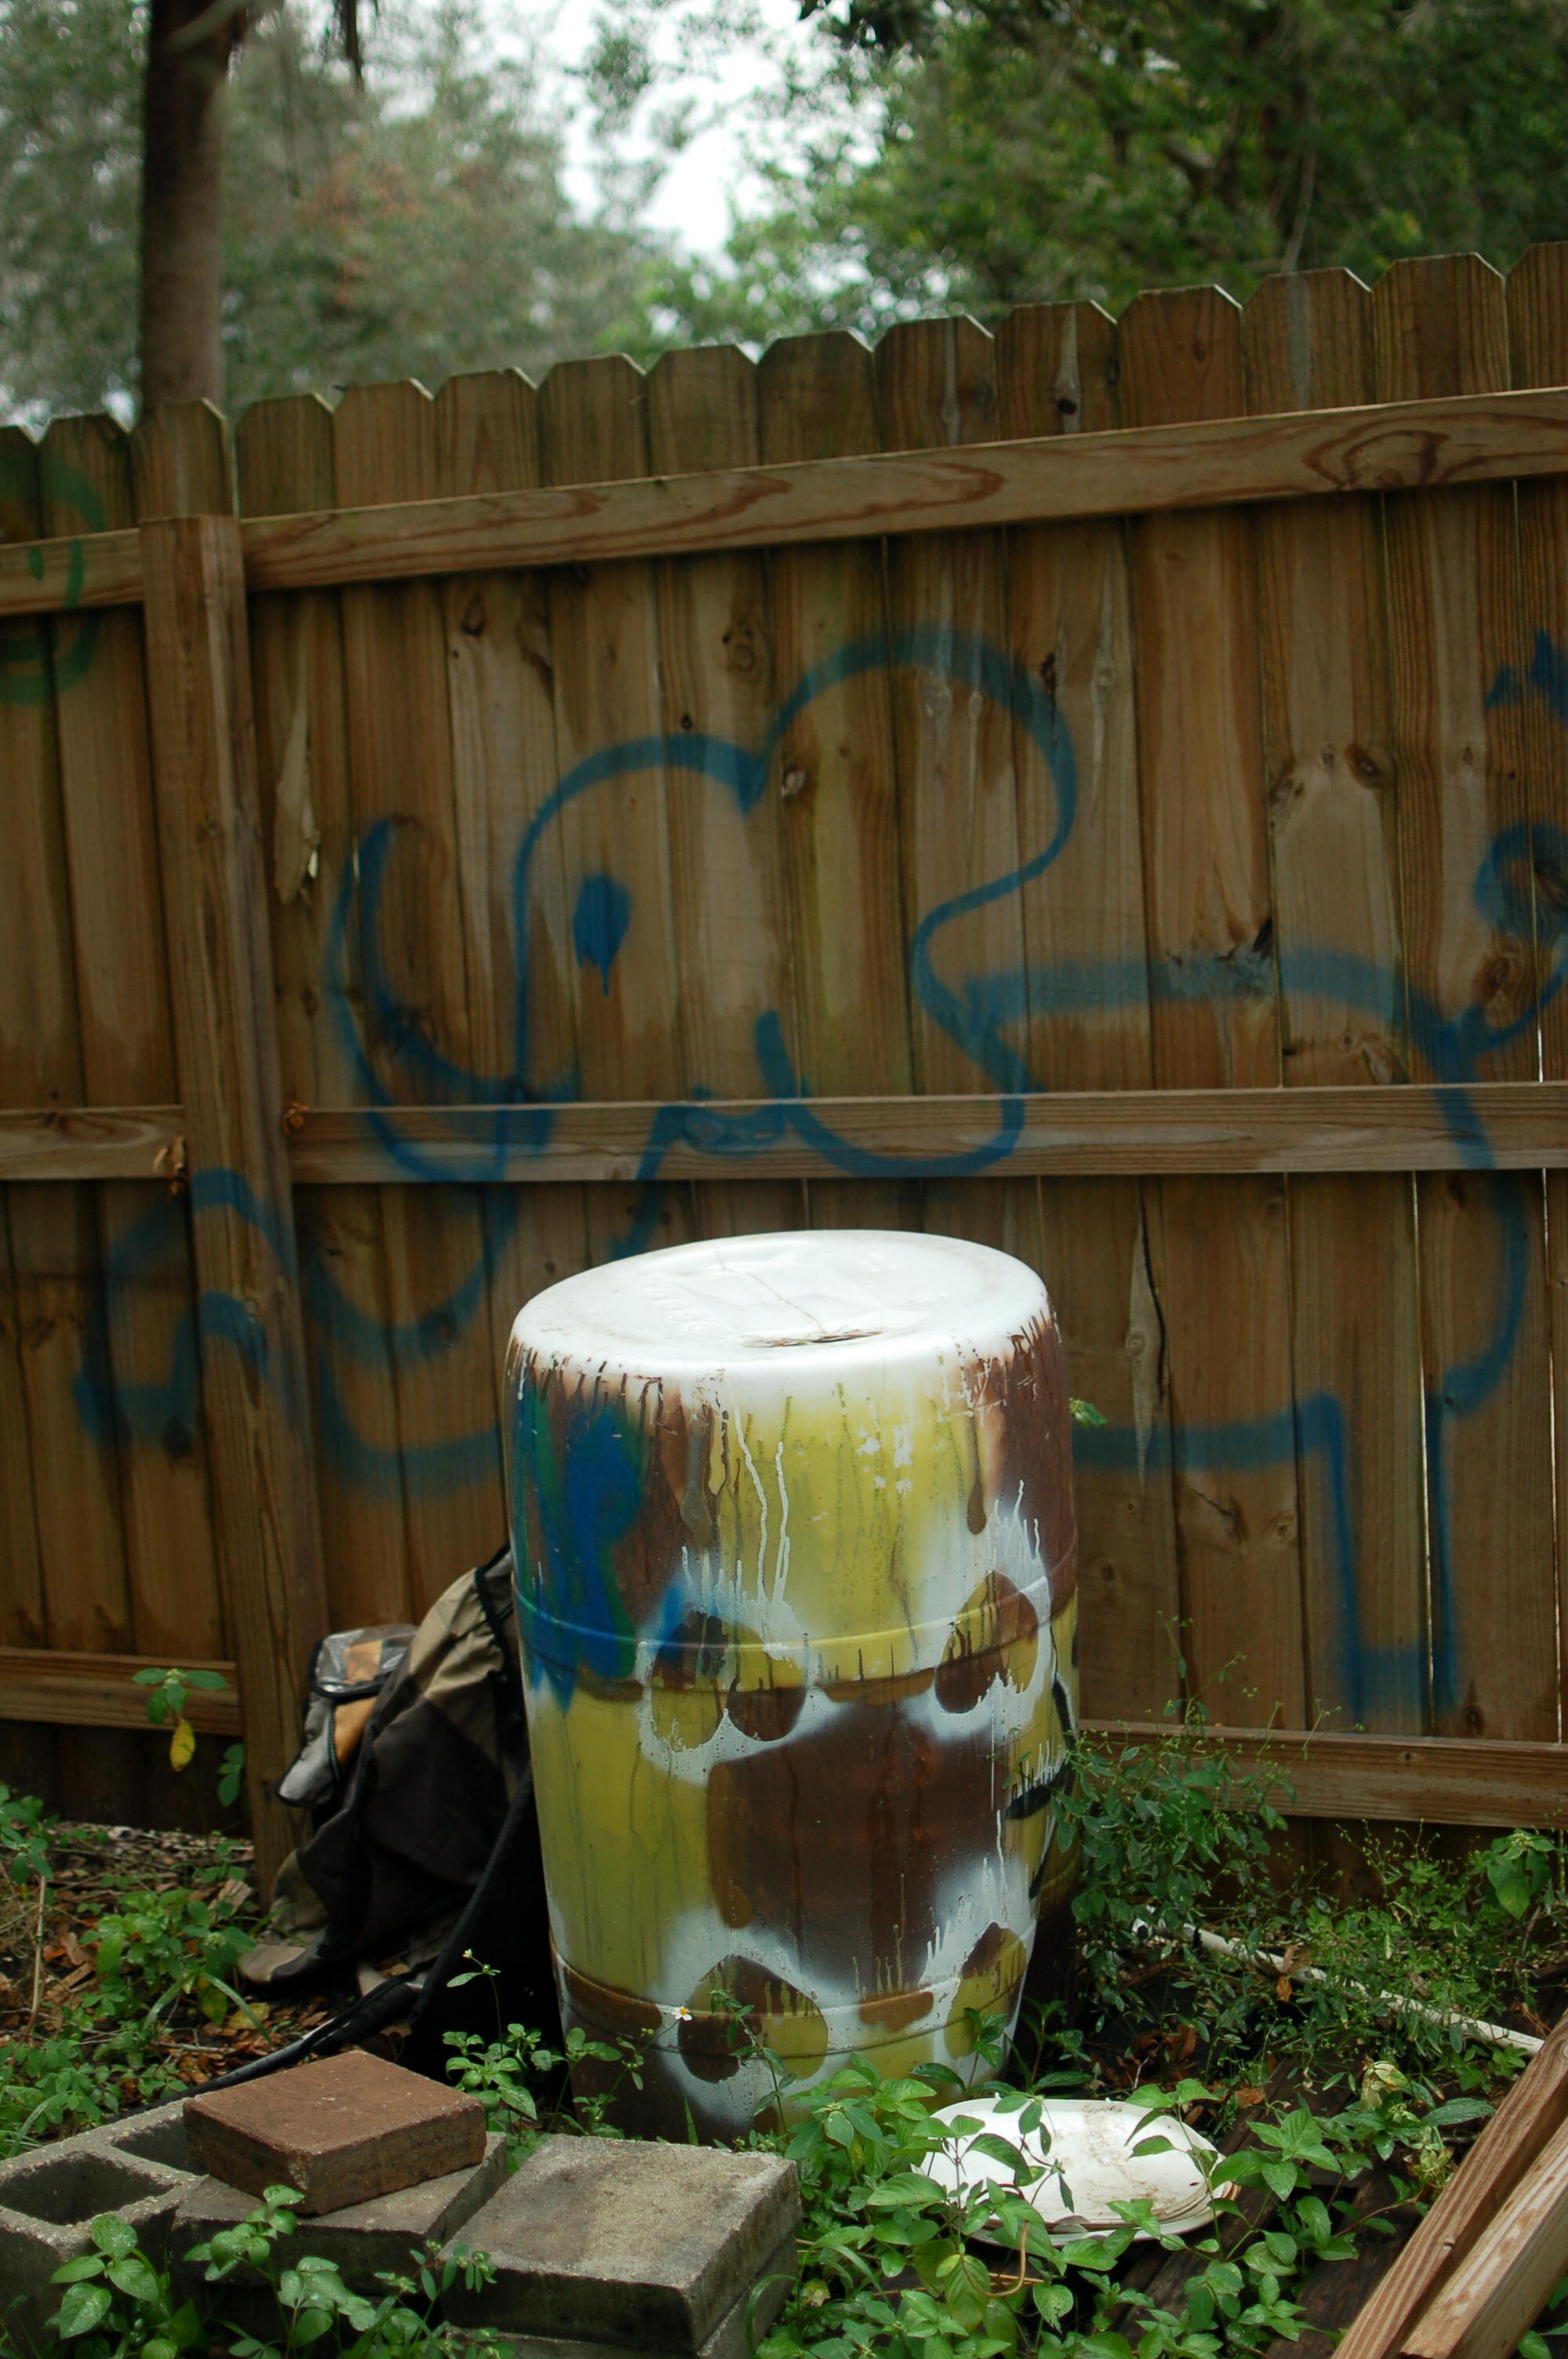 i 4 - compost - compost art - photos-5858.jpg